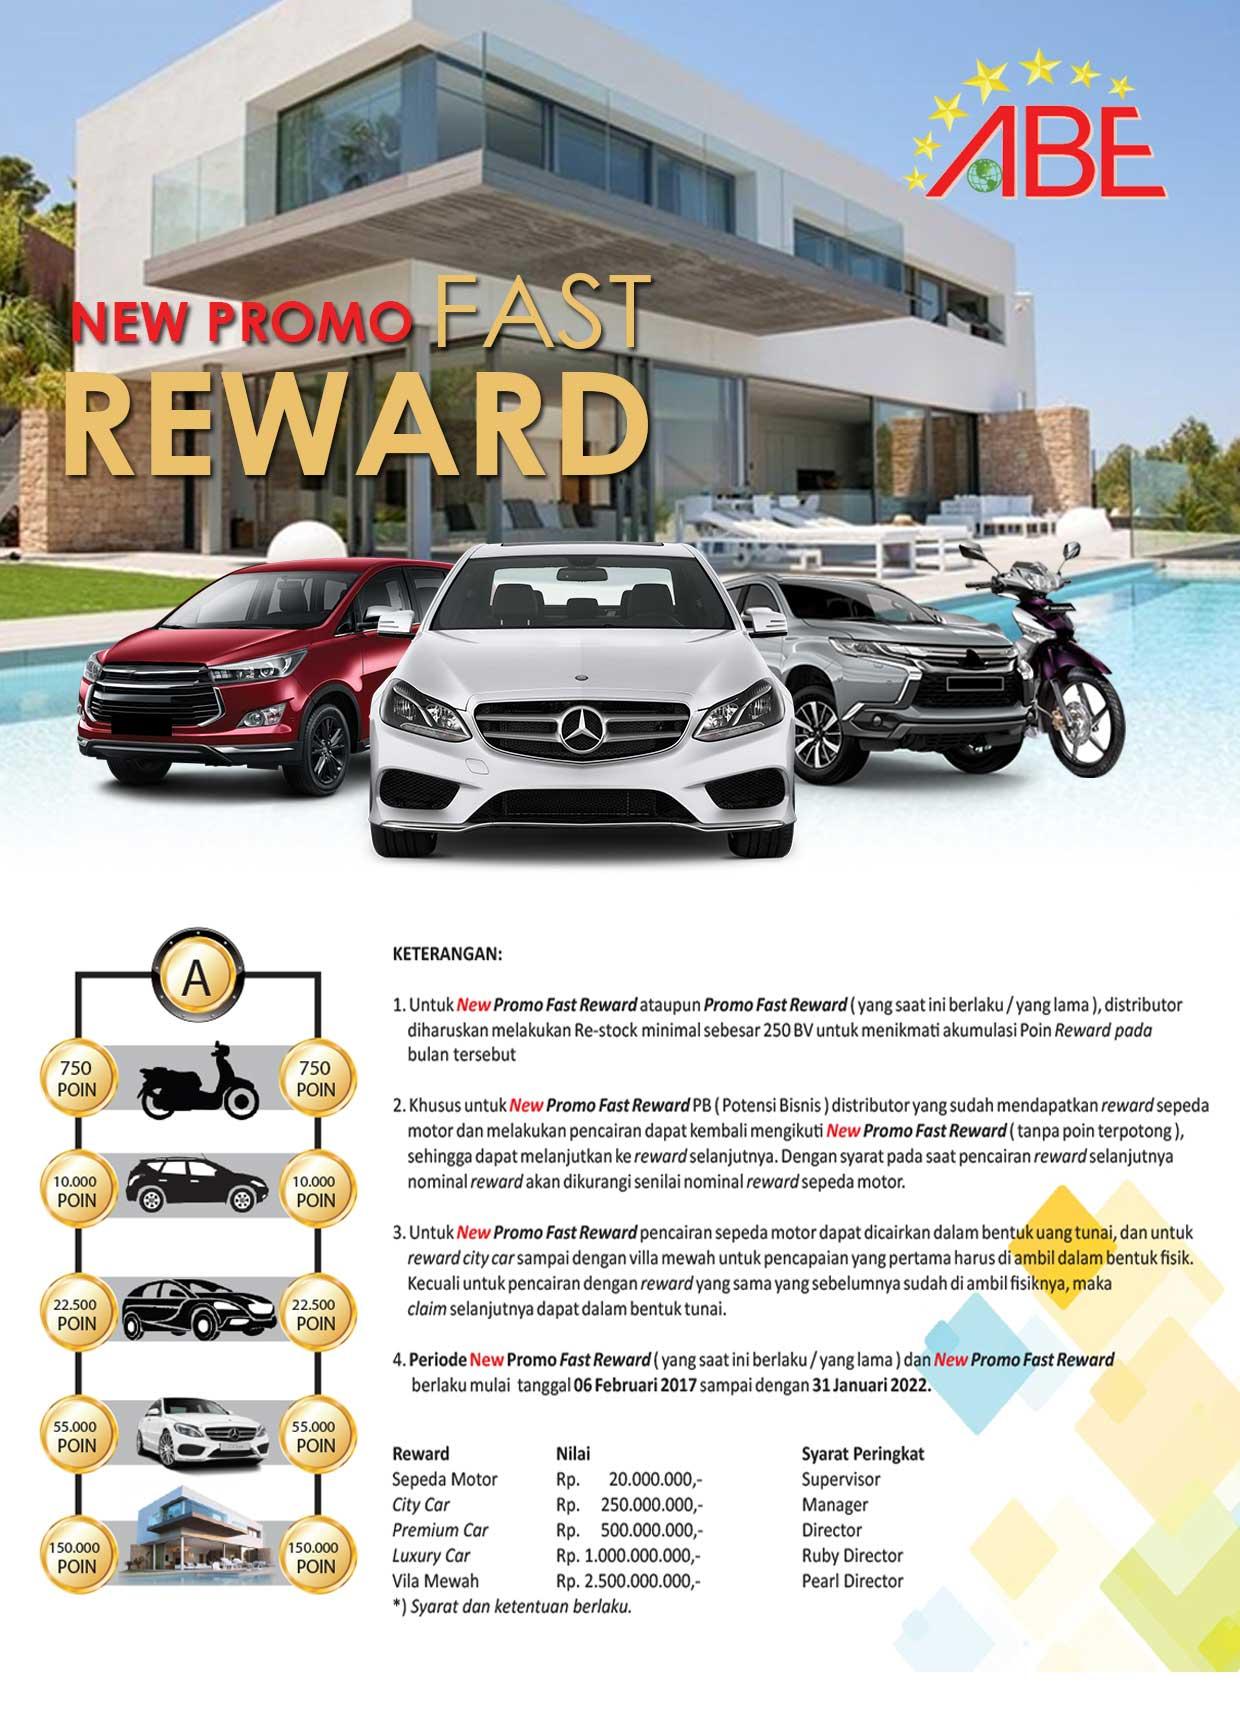 Promo Fast Reward Abenetwork